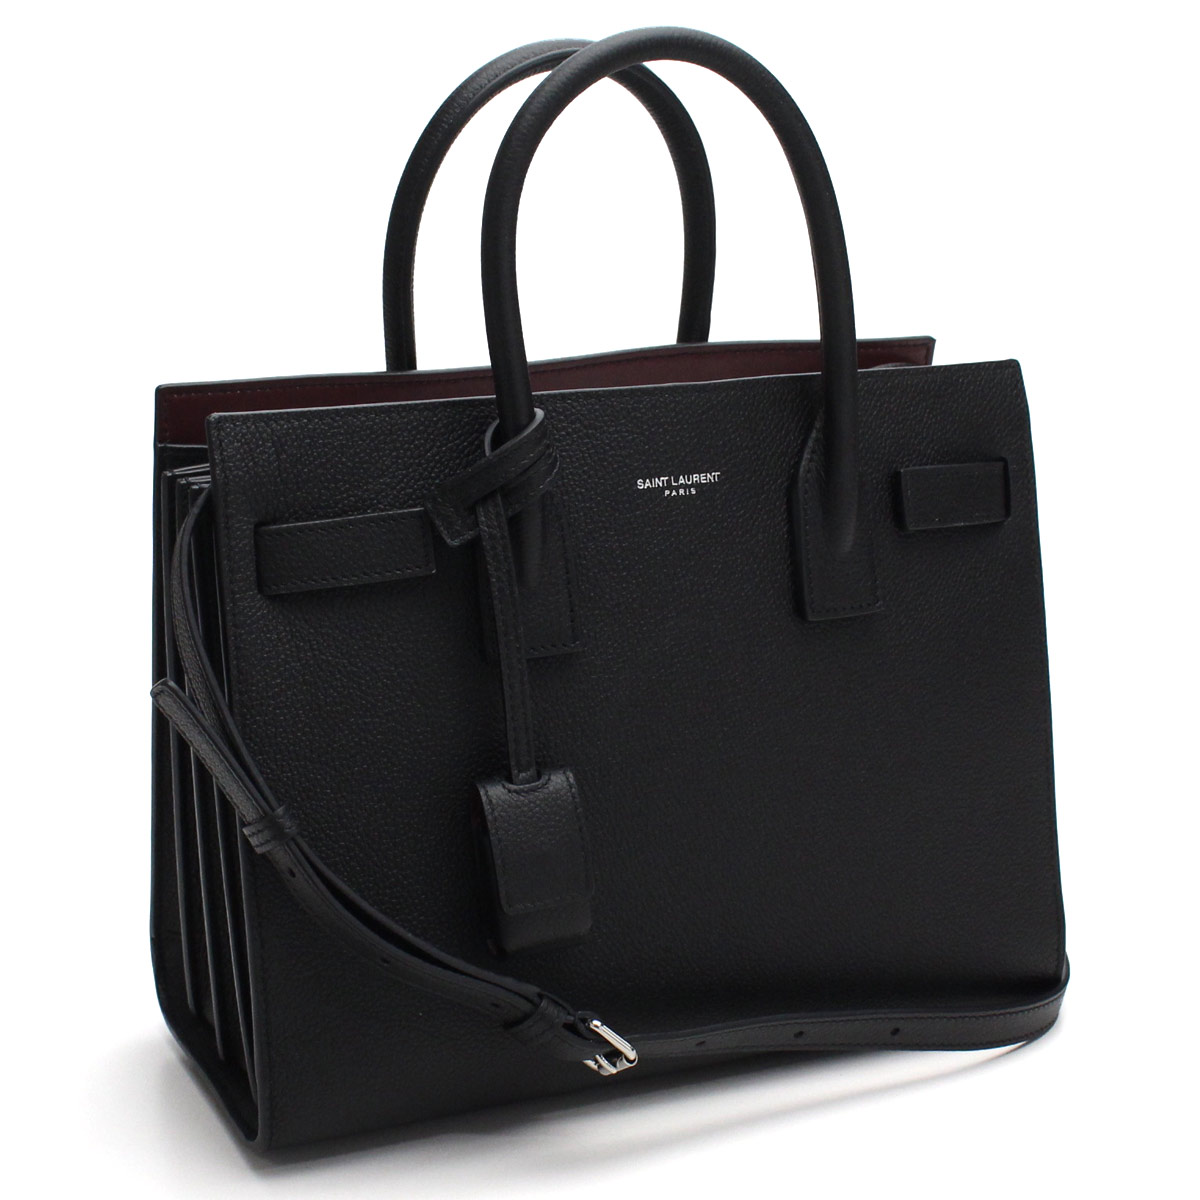 e00ebe115f Bighit The total brand wholesale: Saint-Laurent (SAINT LAURENT) SAC DE JOUR  2WAY tote bag 421863 B681N 1091 black   Rakuten Global Market